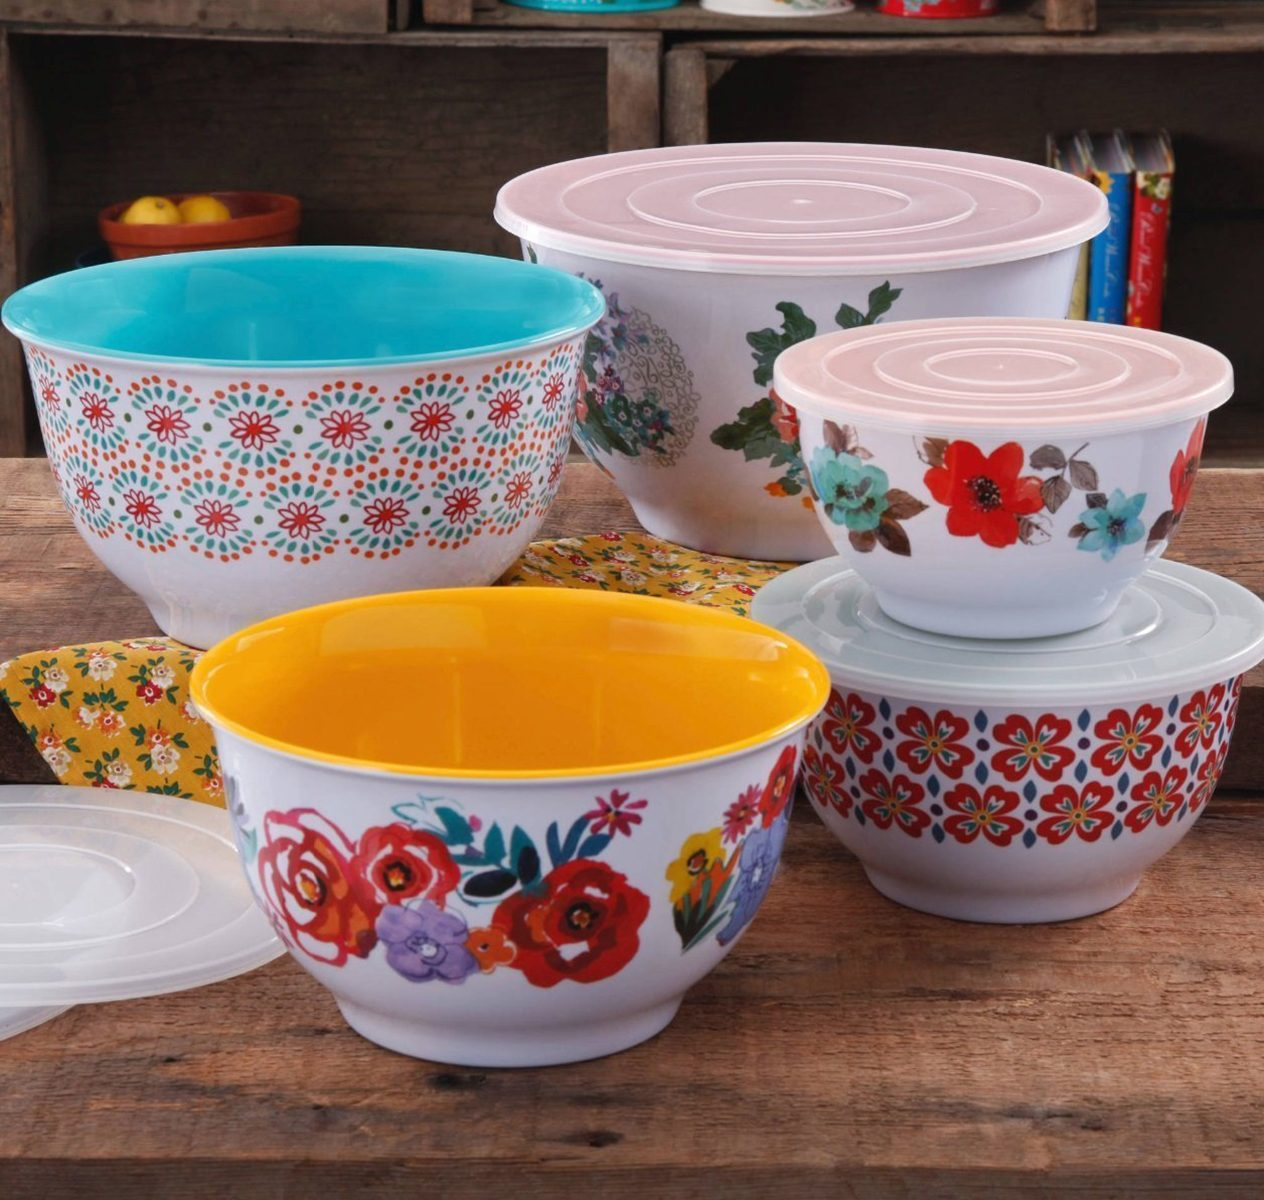 Pioneer Woman nesting mixing bowls